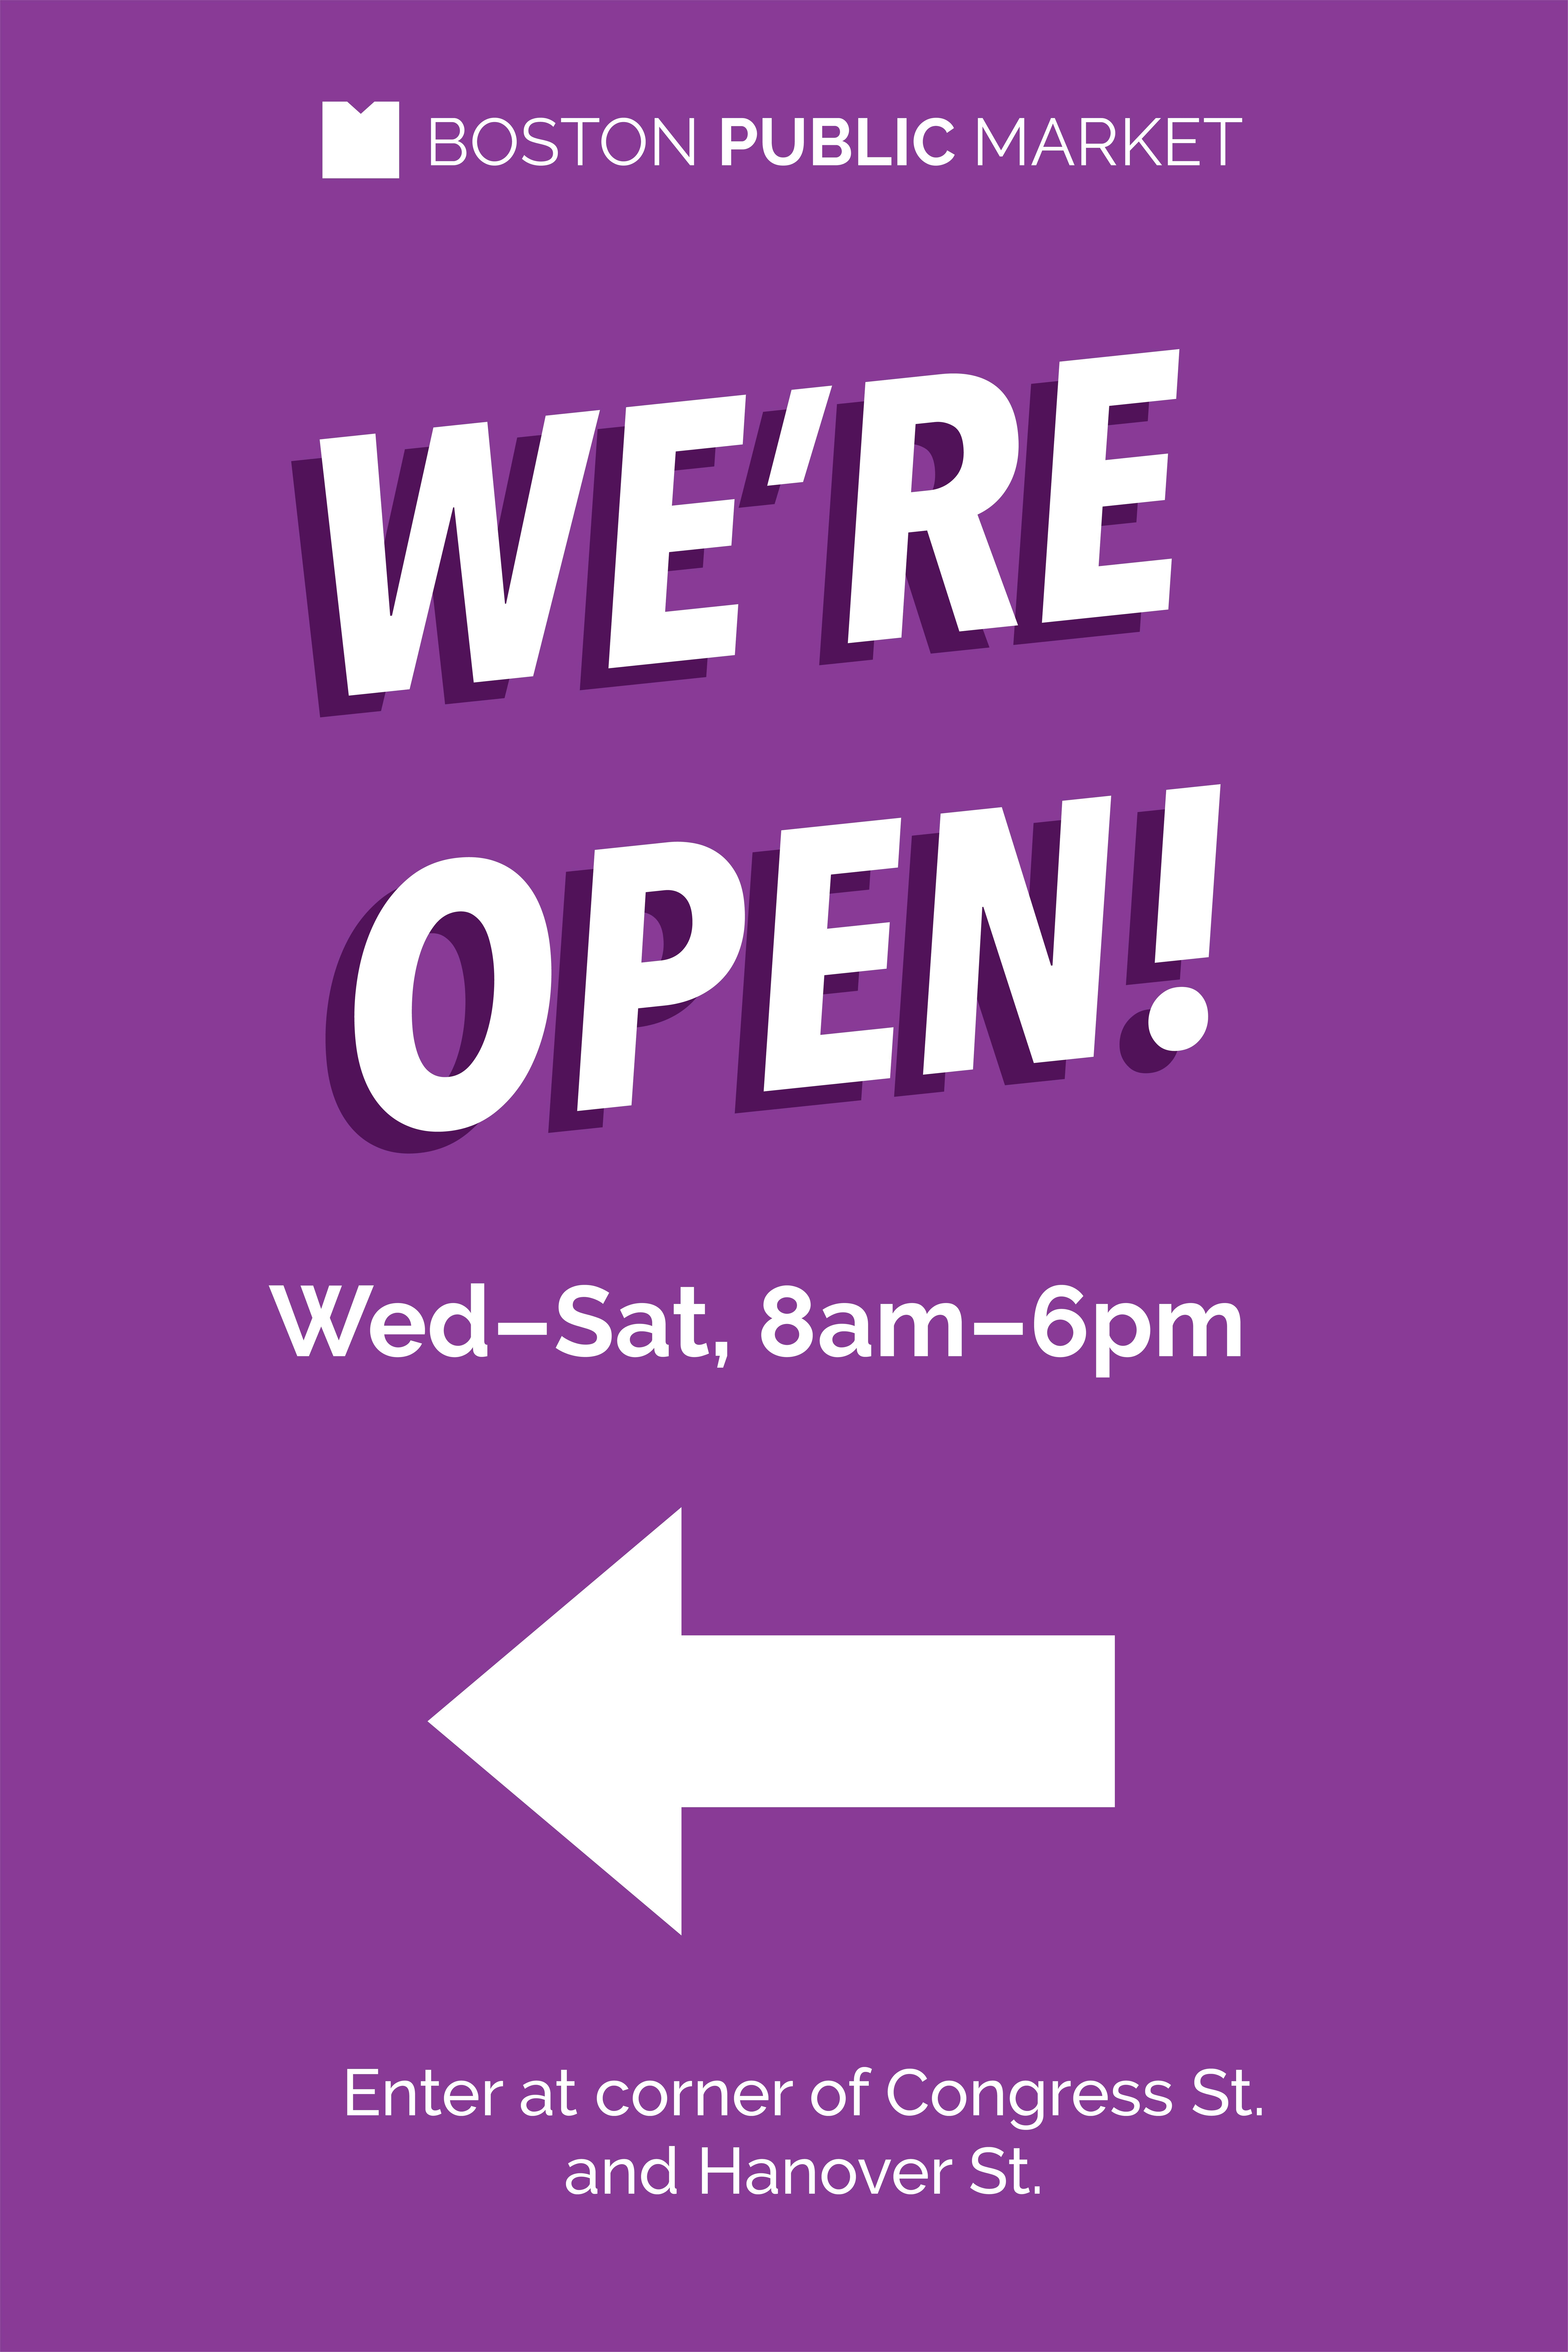 BPM_WEREOPEN_signs_sandwich_We're Open 2